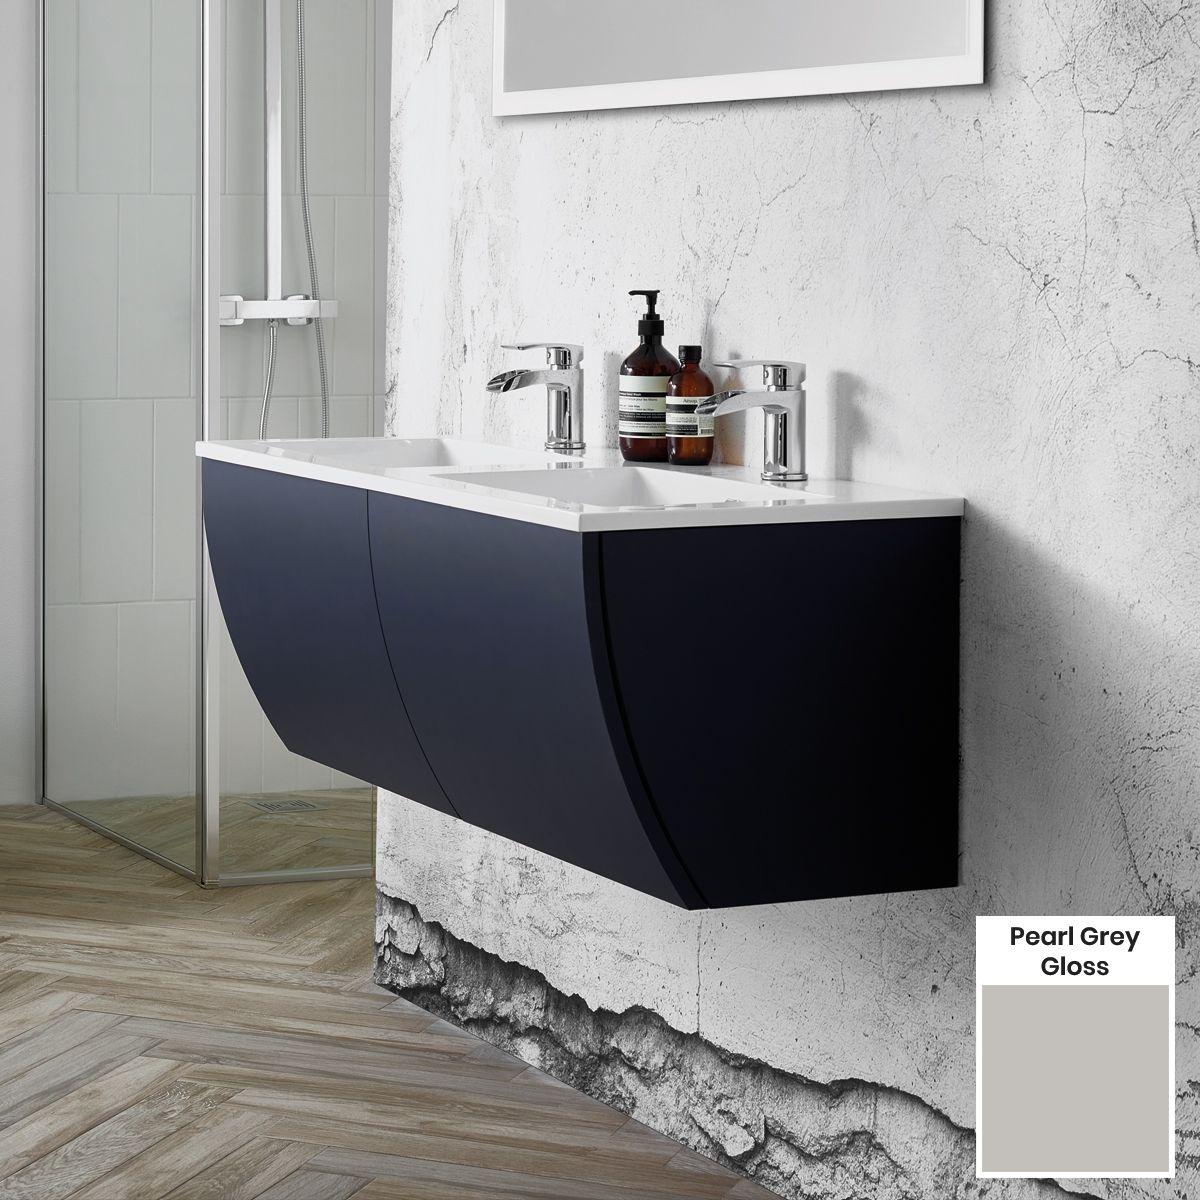 Elation Kiyo Pearl Grey Gloss Vanity Unit 1100mm